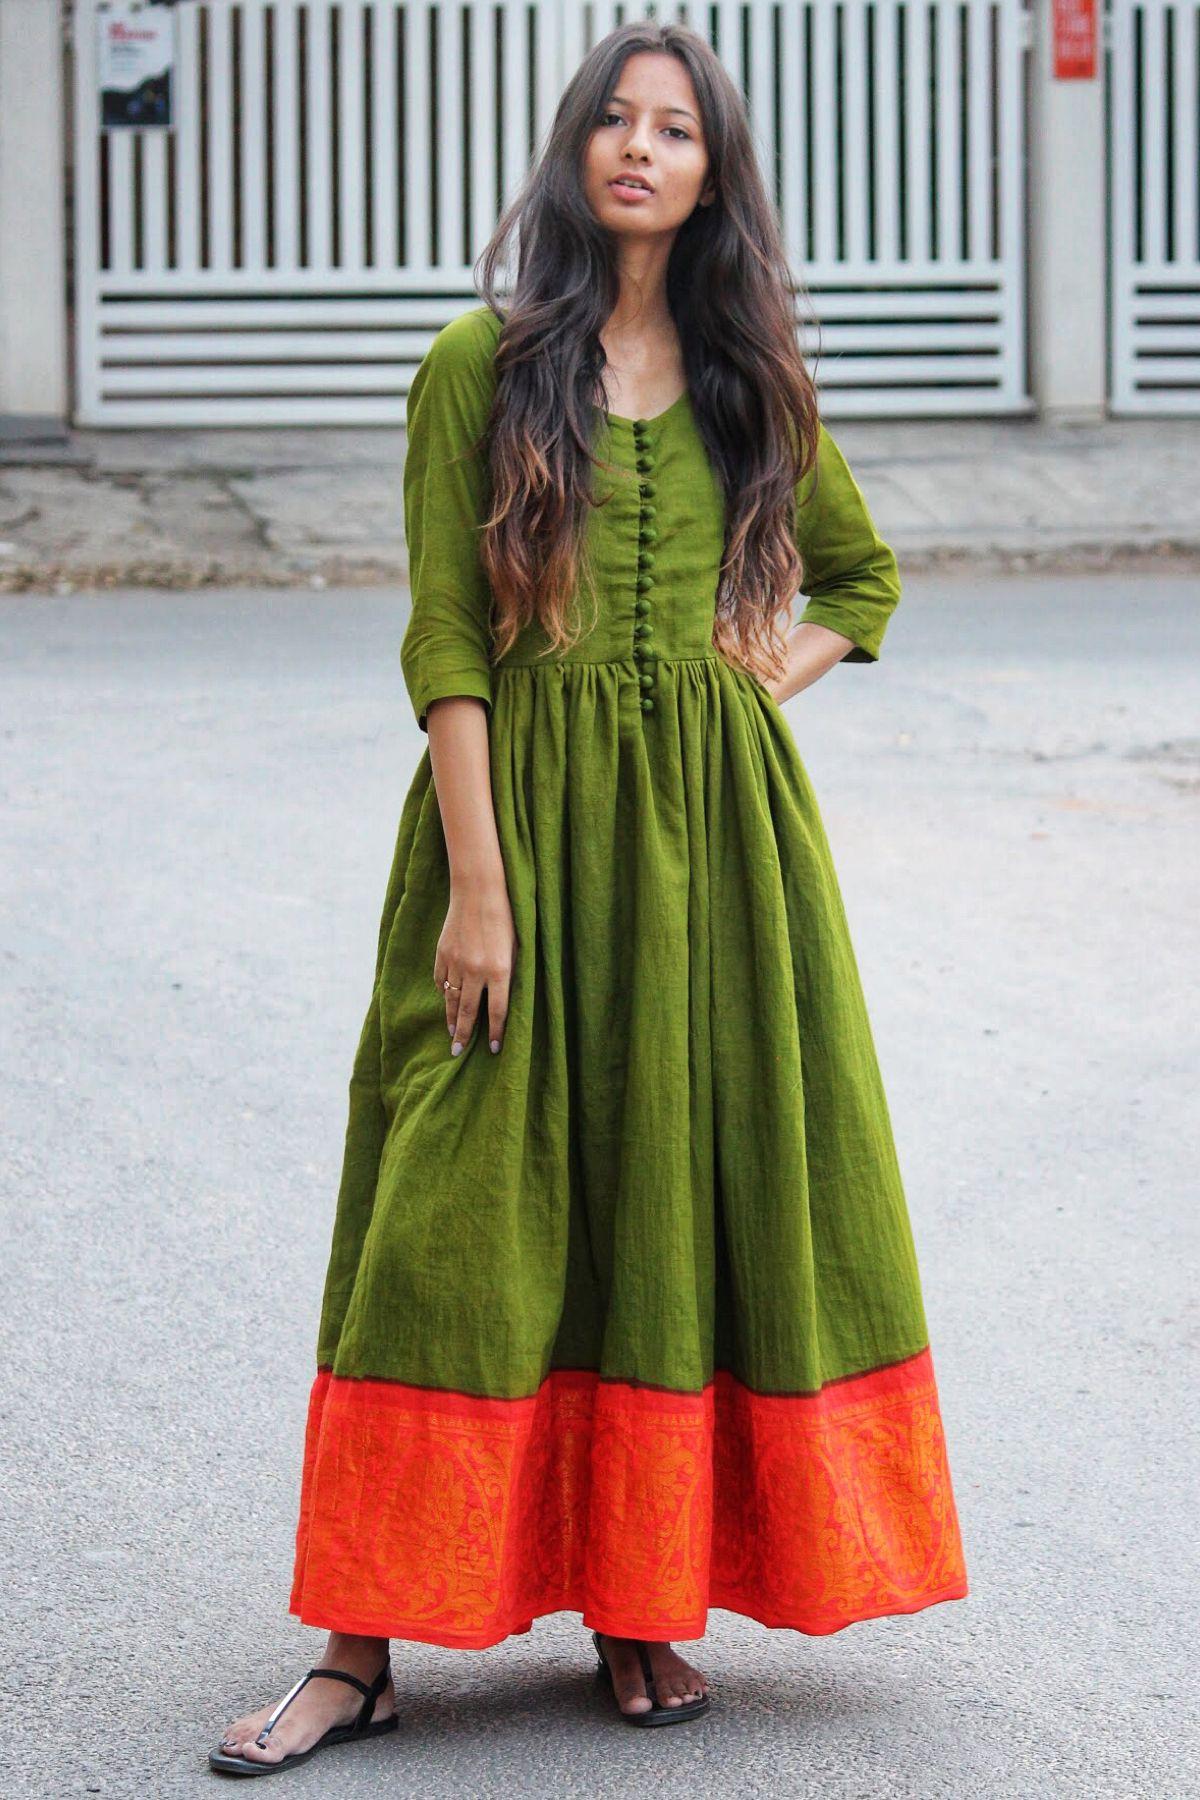 32adafcb41 Ankle length Fit & Flare Madurai Saree Dress | Liberate The Saree in ...